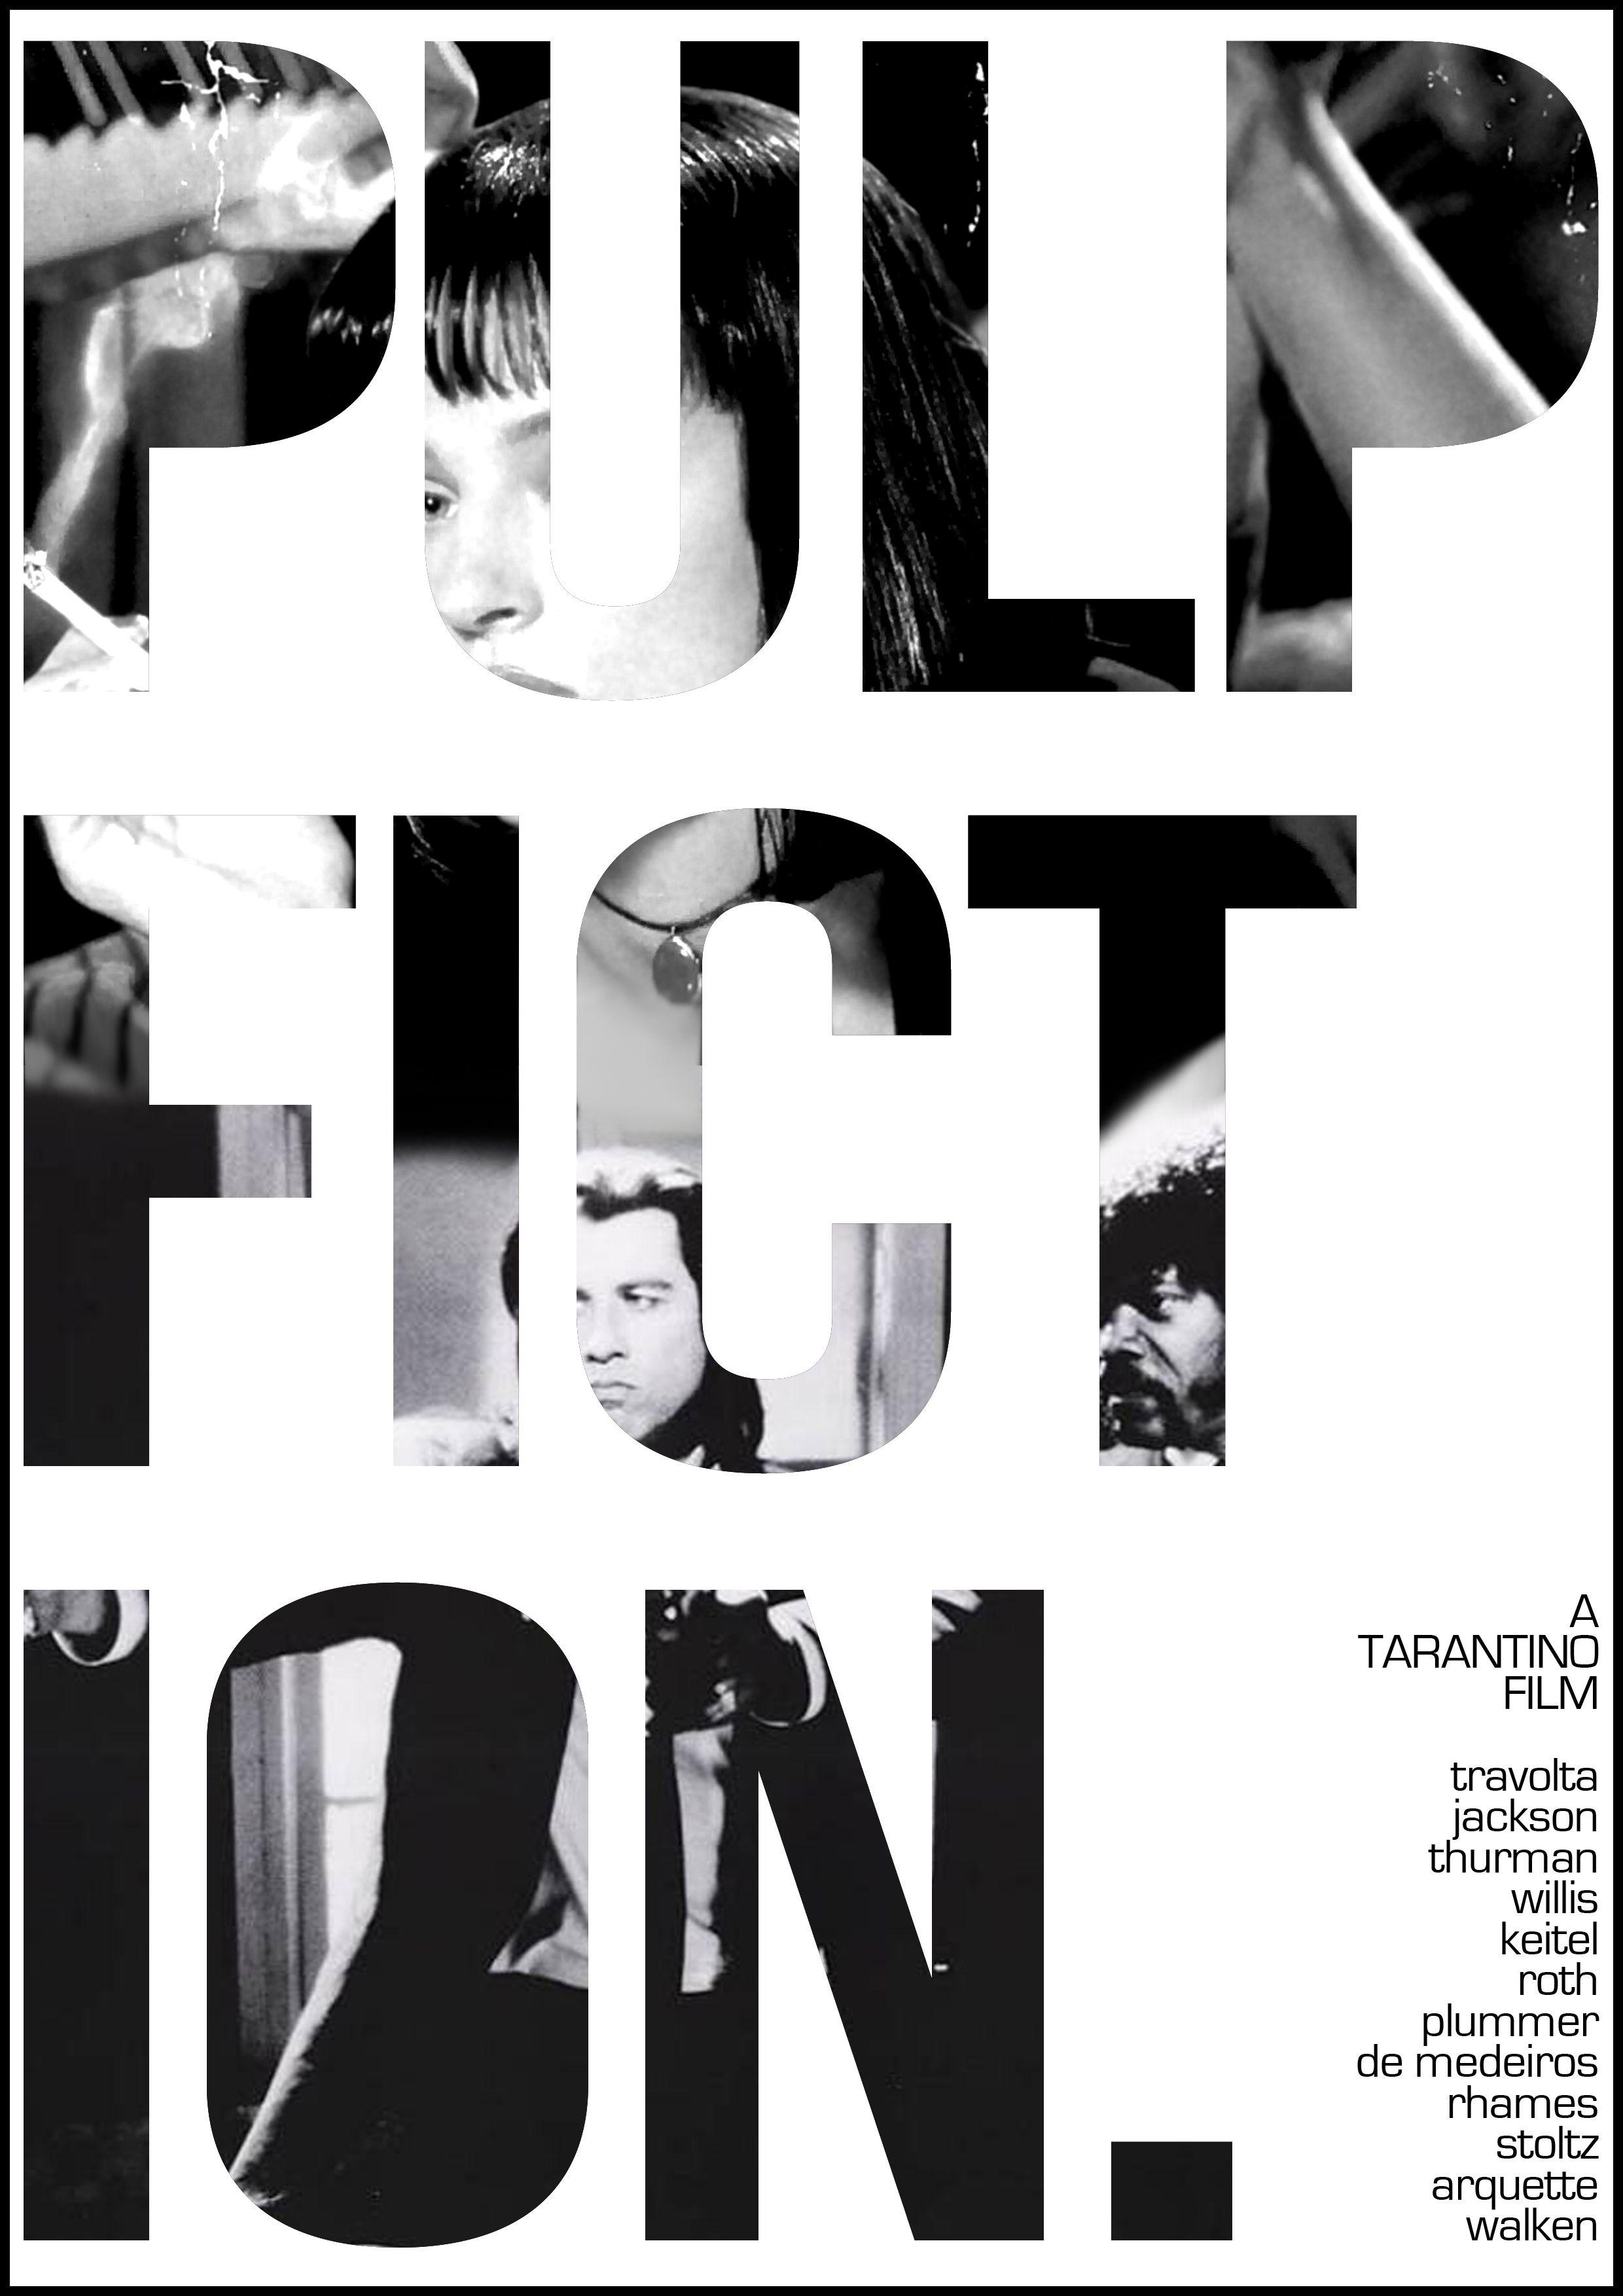 Poster design monochrome - Pulp Fiction Poster